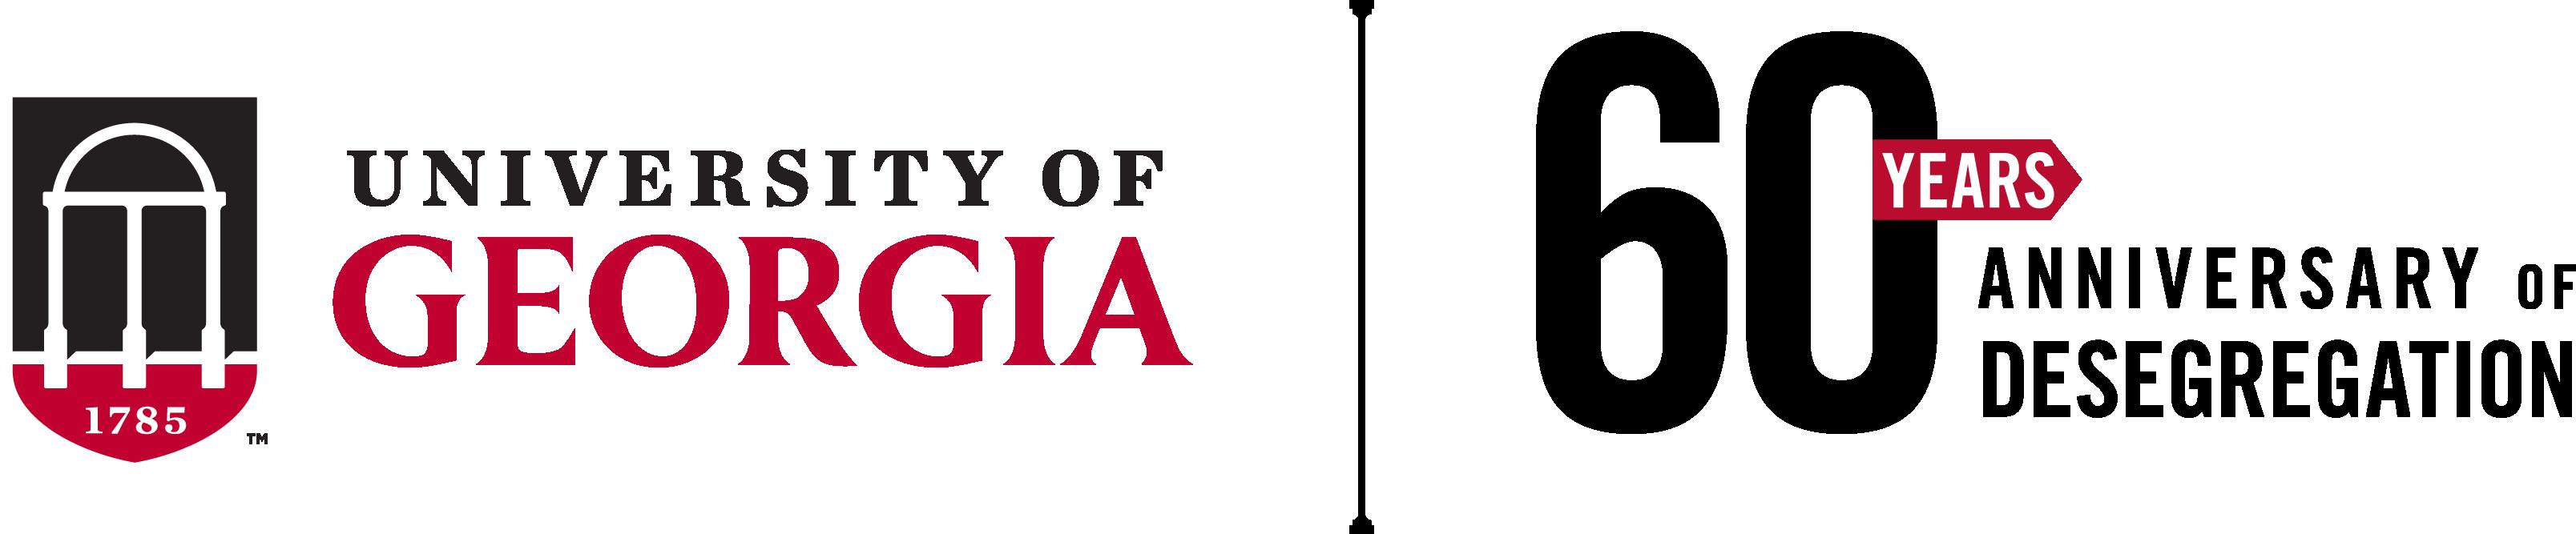 Uga Academic Calendar Fall 2022.2020 2021 Signature Lectures Provost S Office University Of Georgia